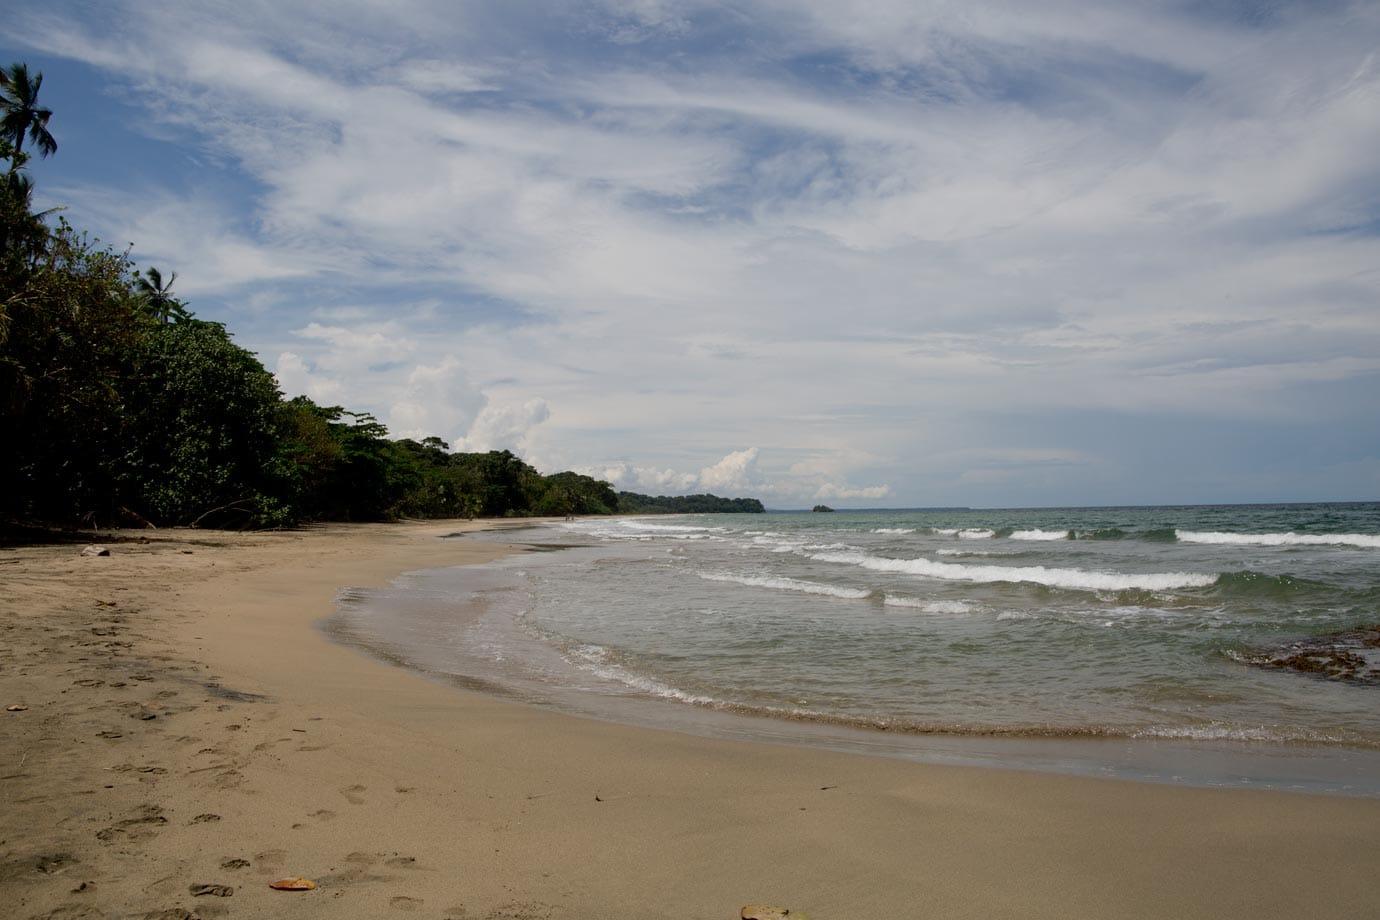 A quiet beach outside Puerto Viejo